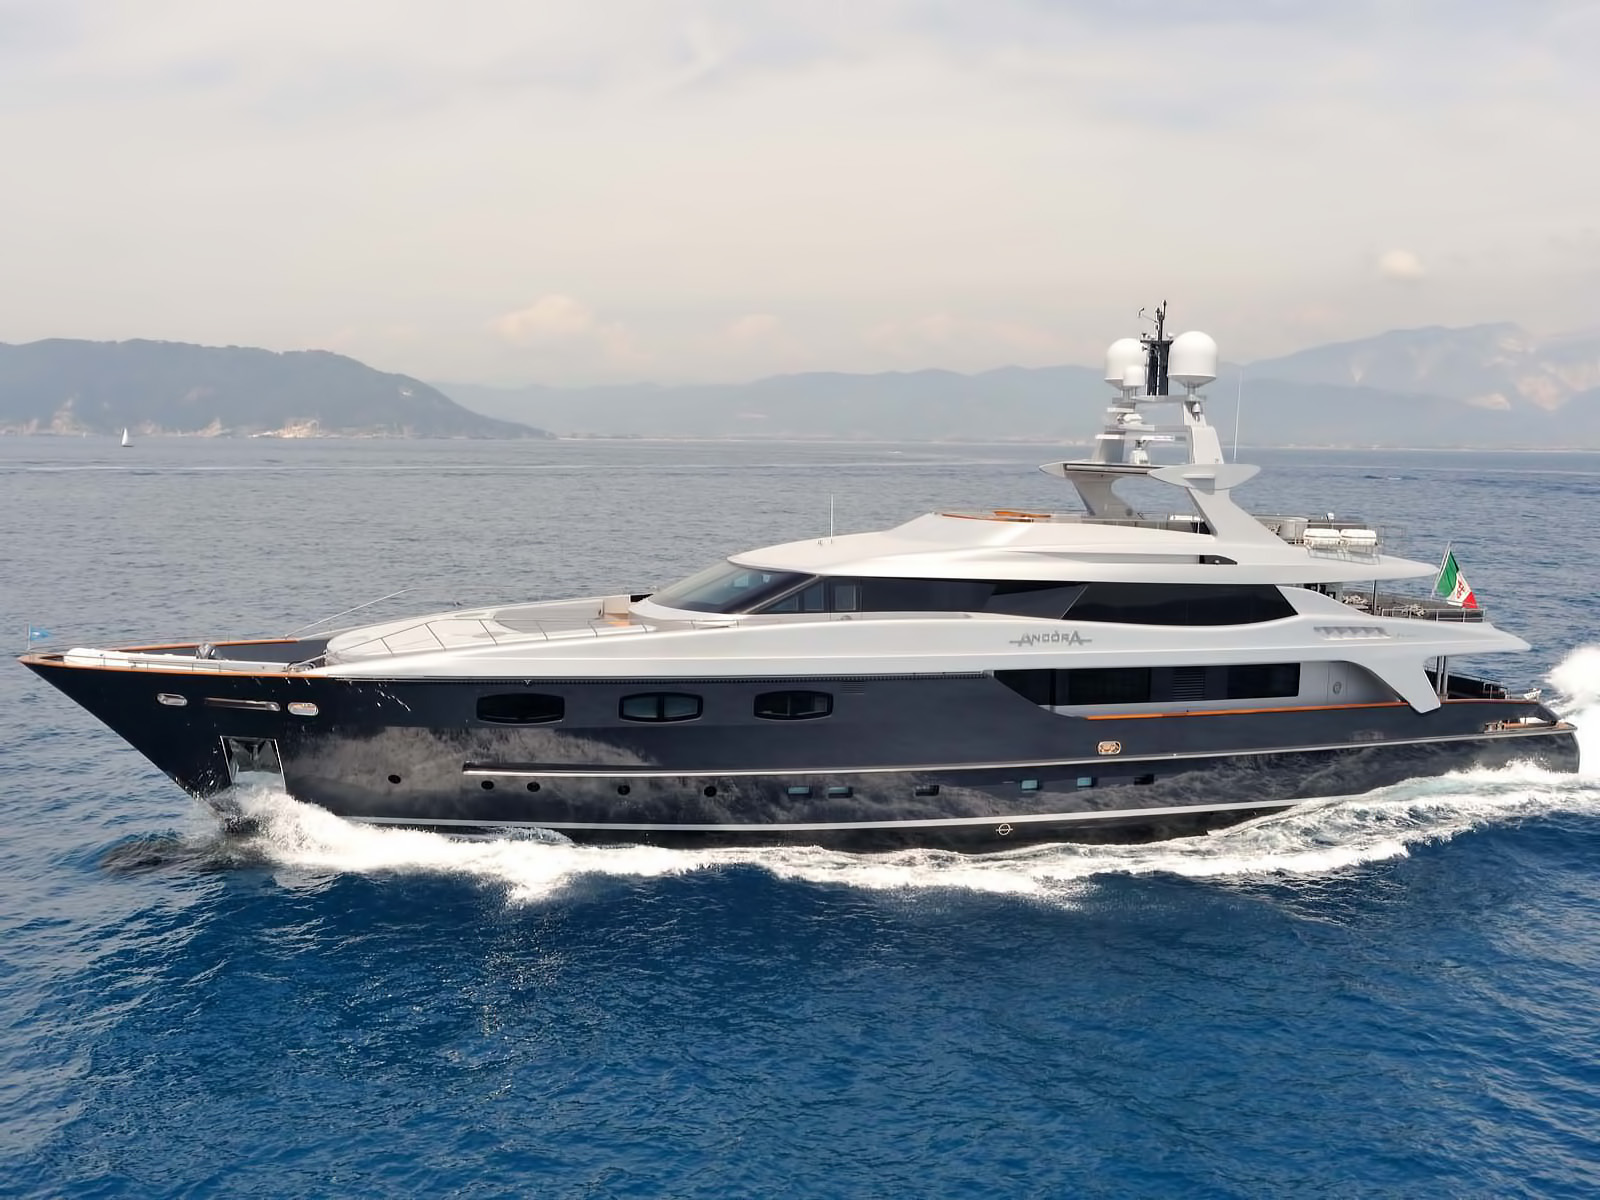 luxury super yacht wallpaper - photo #20